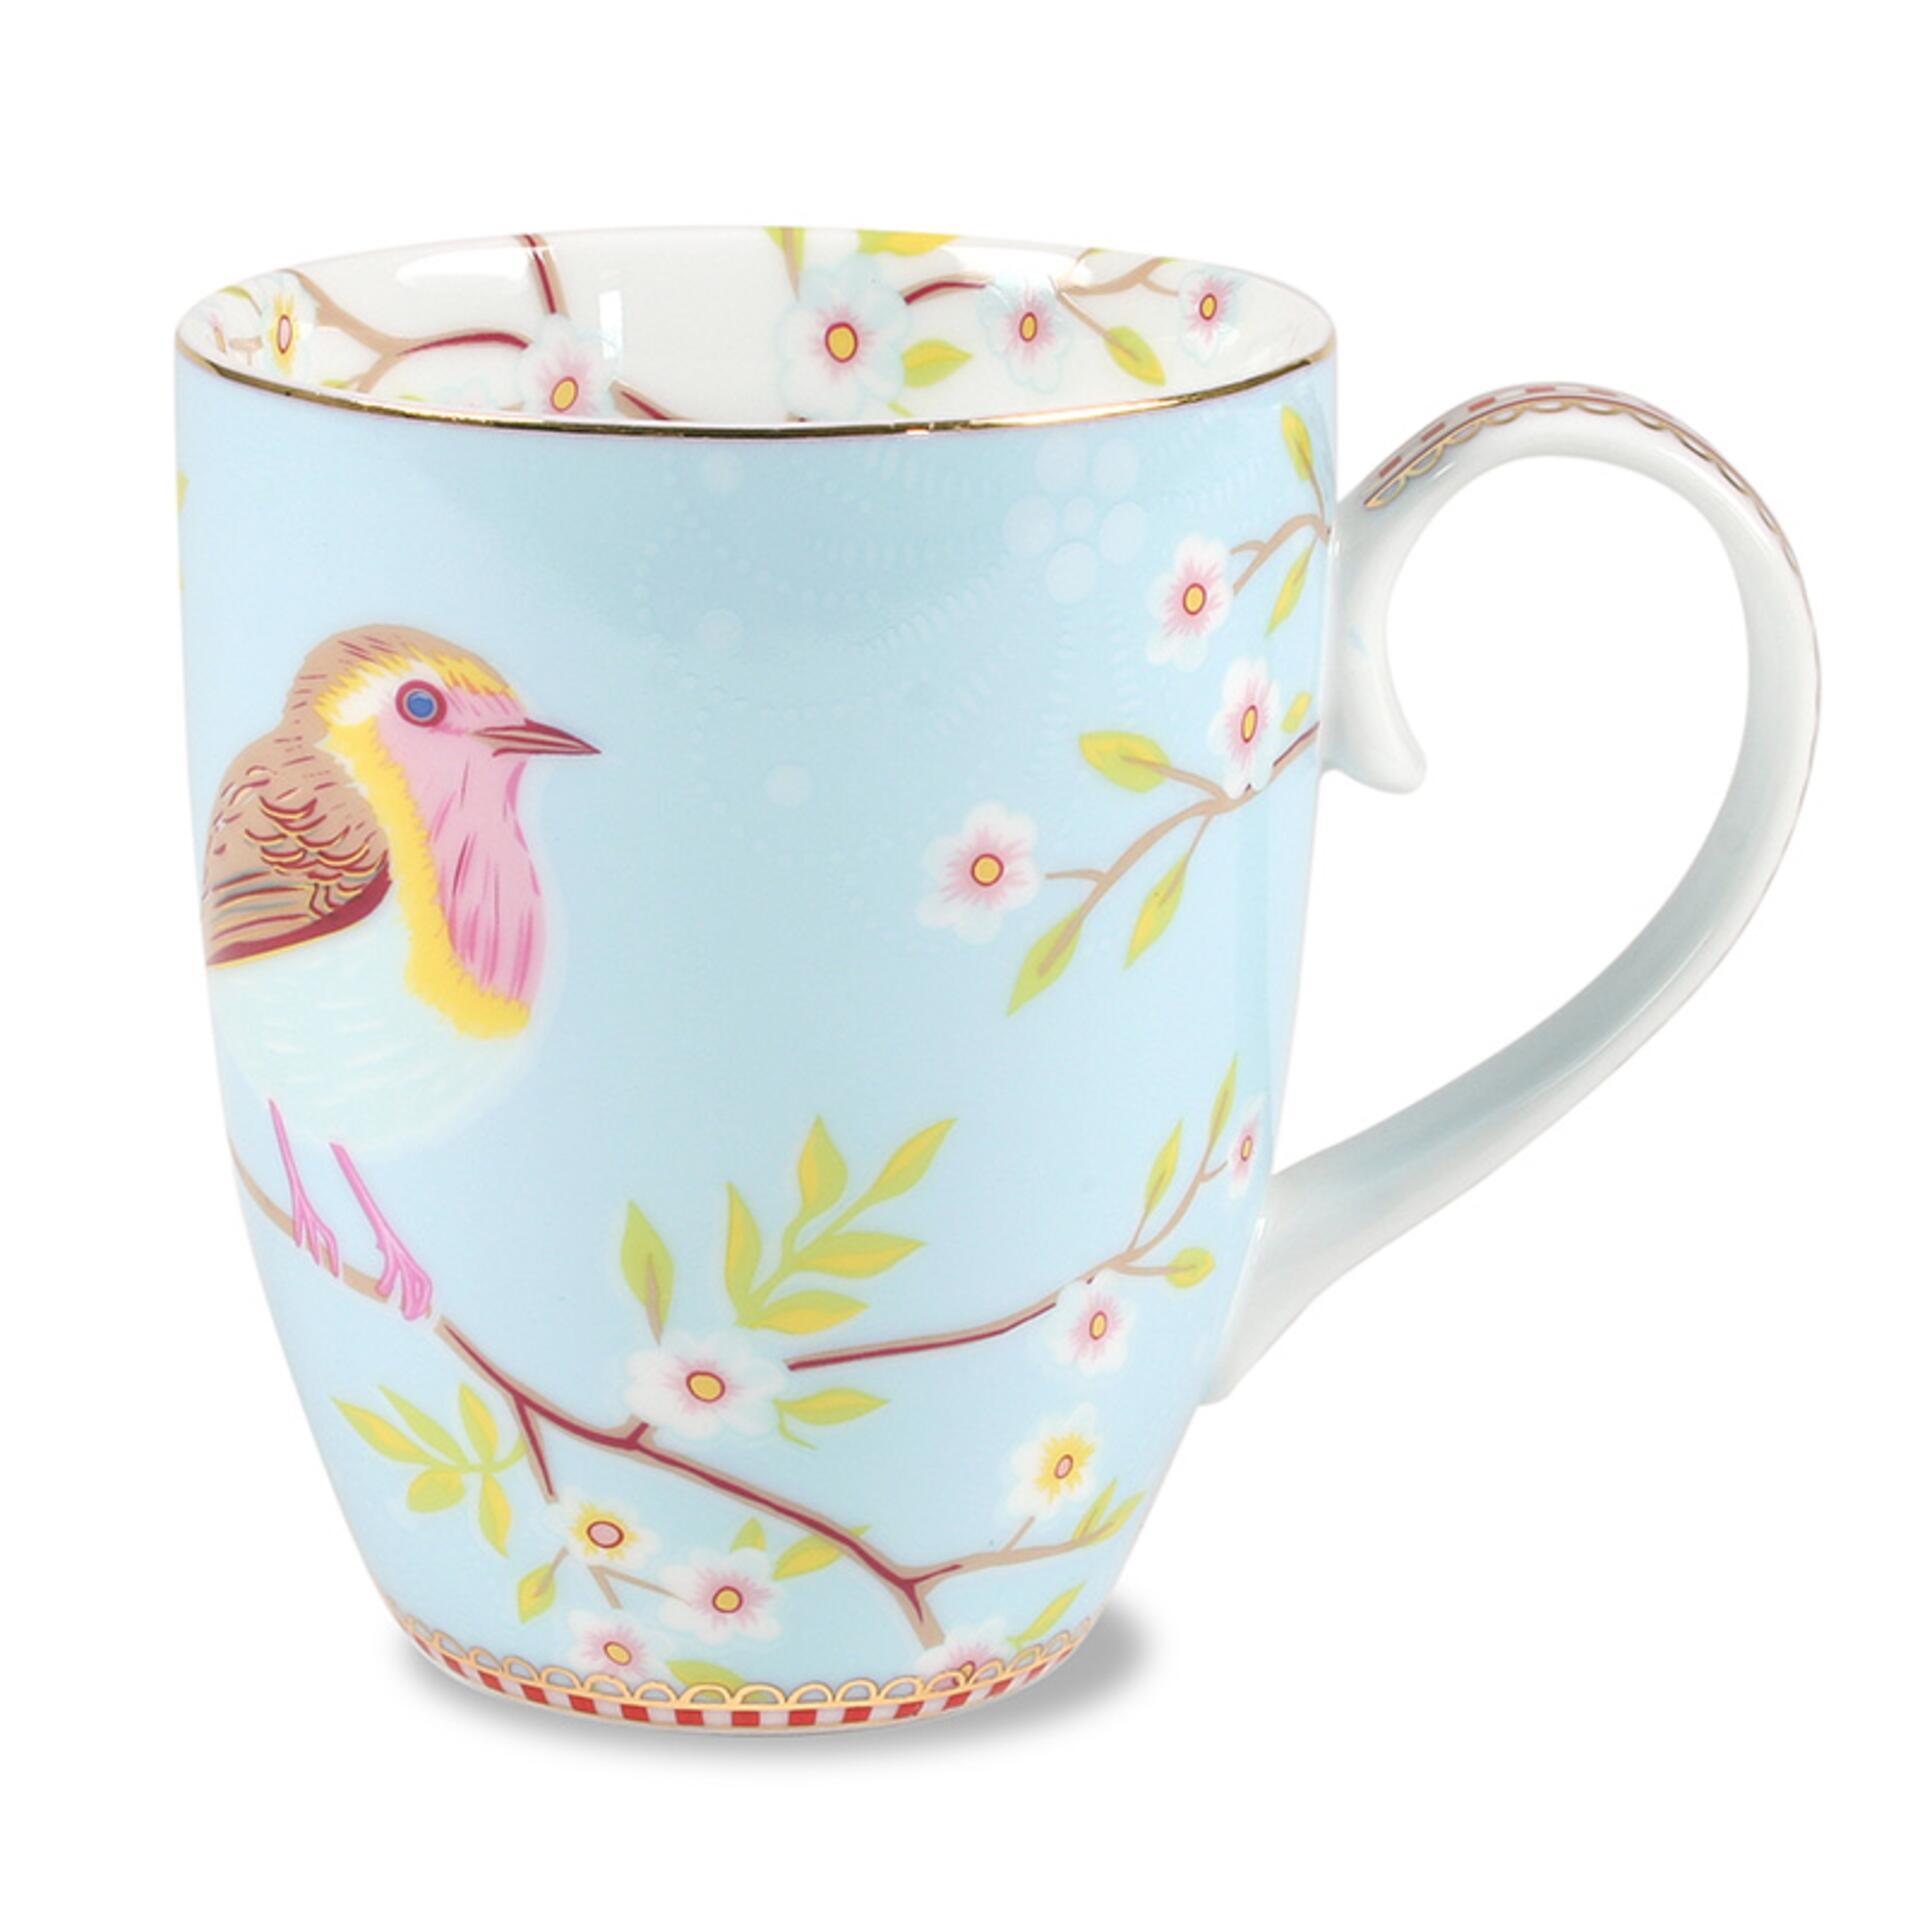 PiP Porzellan Kaffeetasse Early Bird Blau